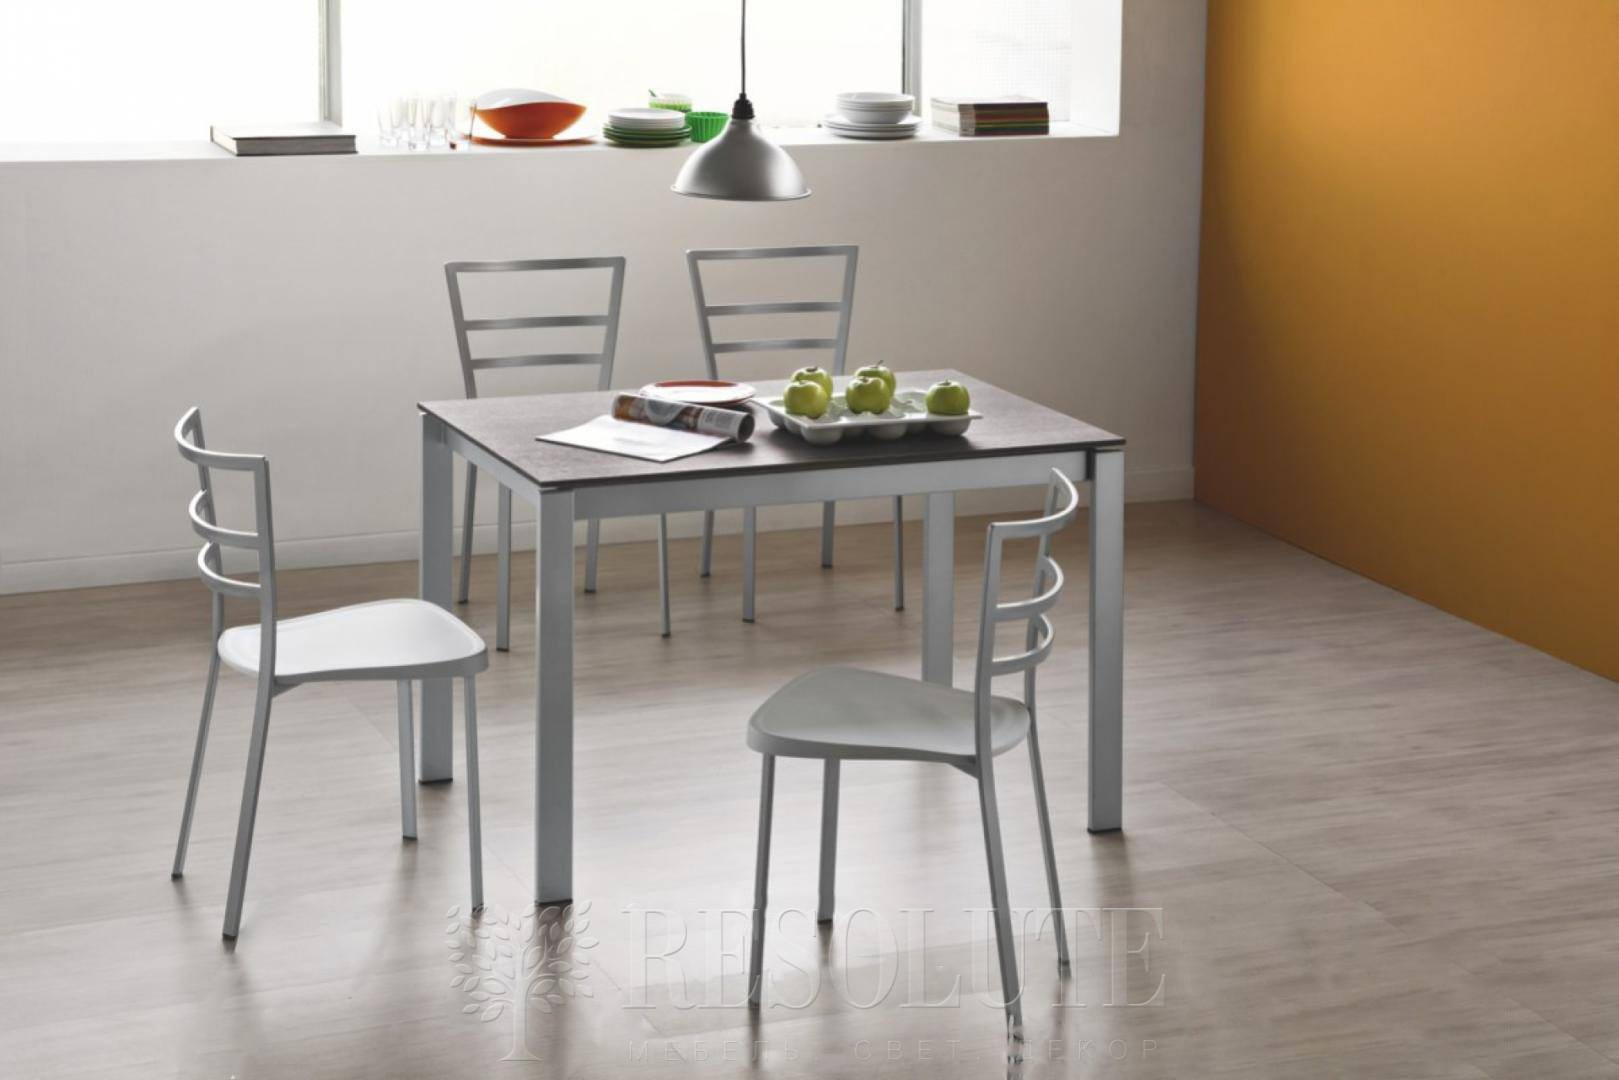 Стол металлический Olivo&Godeassi G/4757 L110 Blog - 2